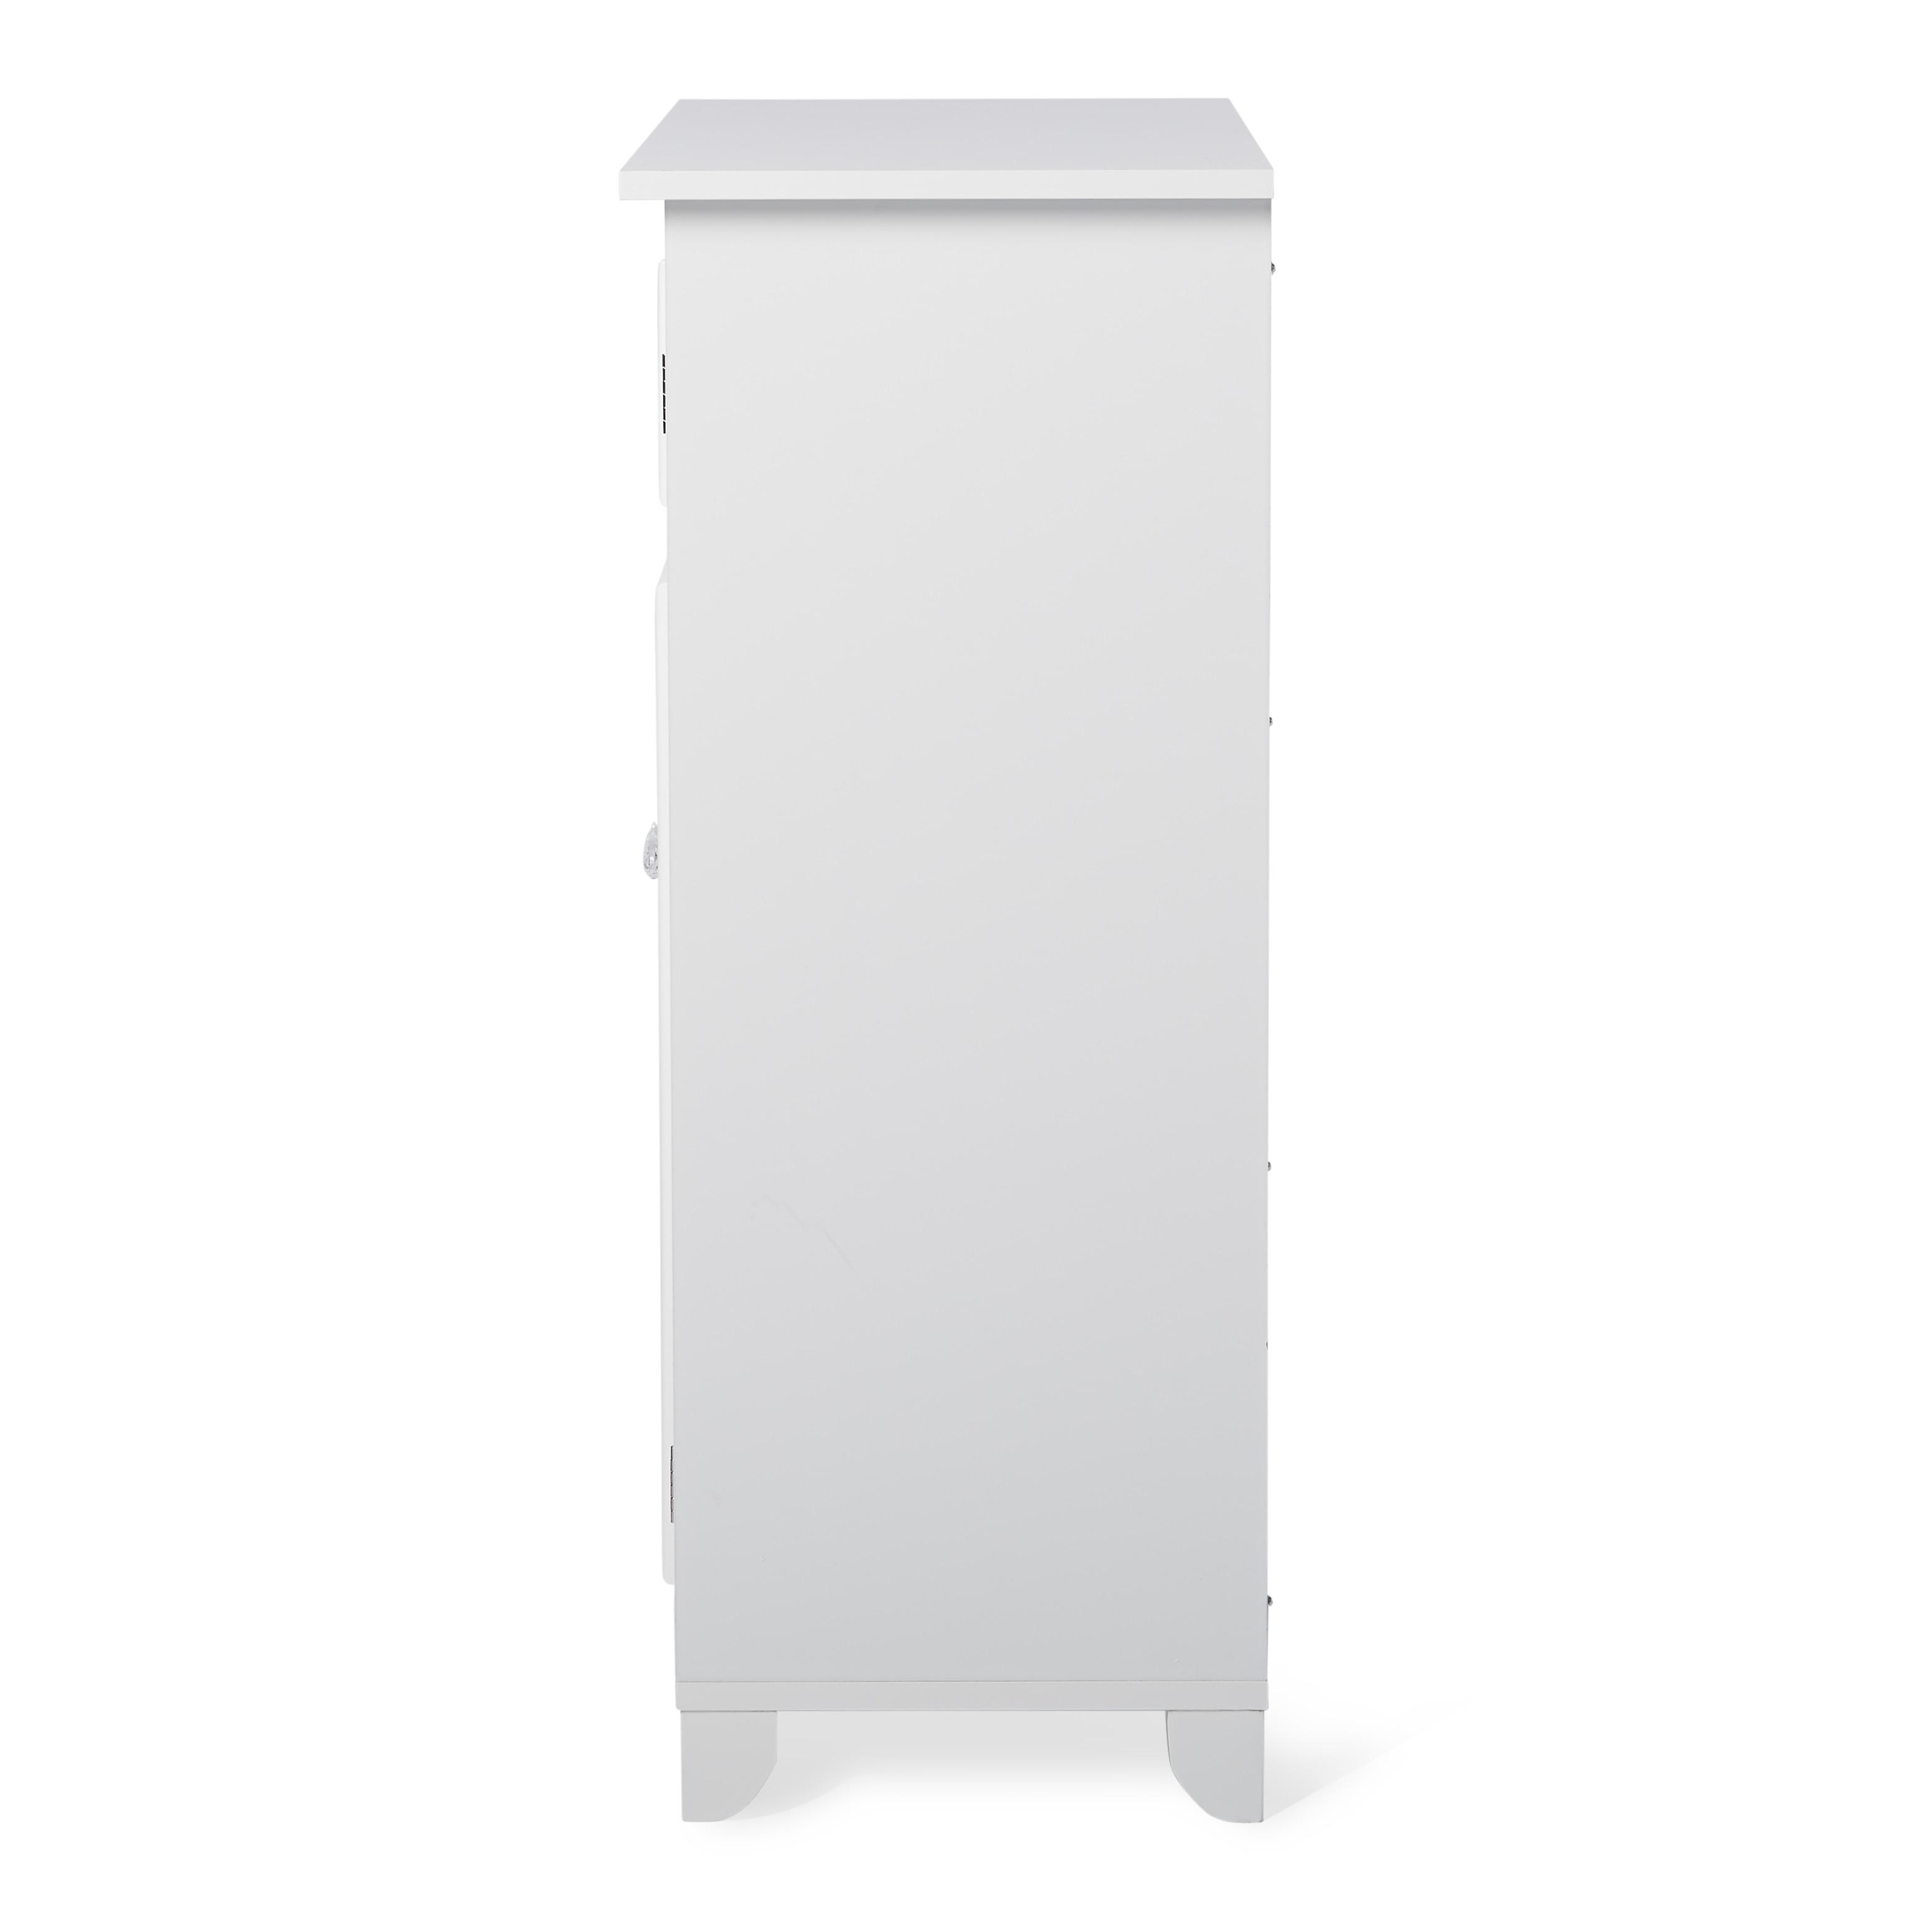 Virgo White 2-door Floor Cabinet by Elegant Home Fashions - Free ...